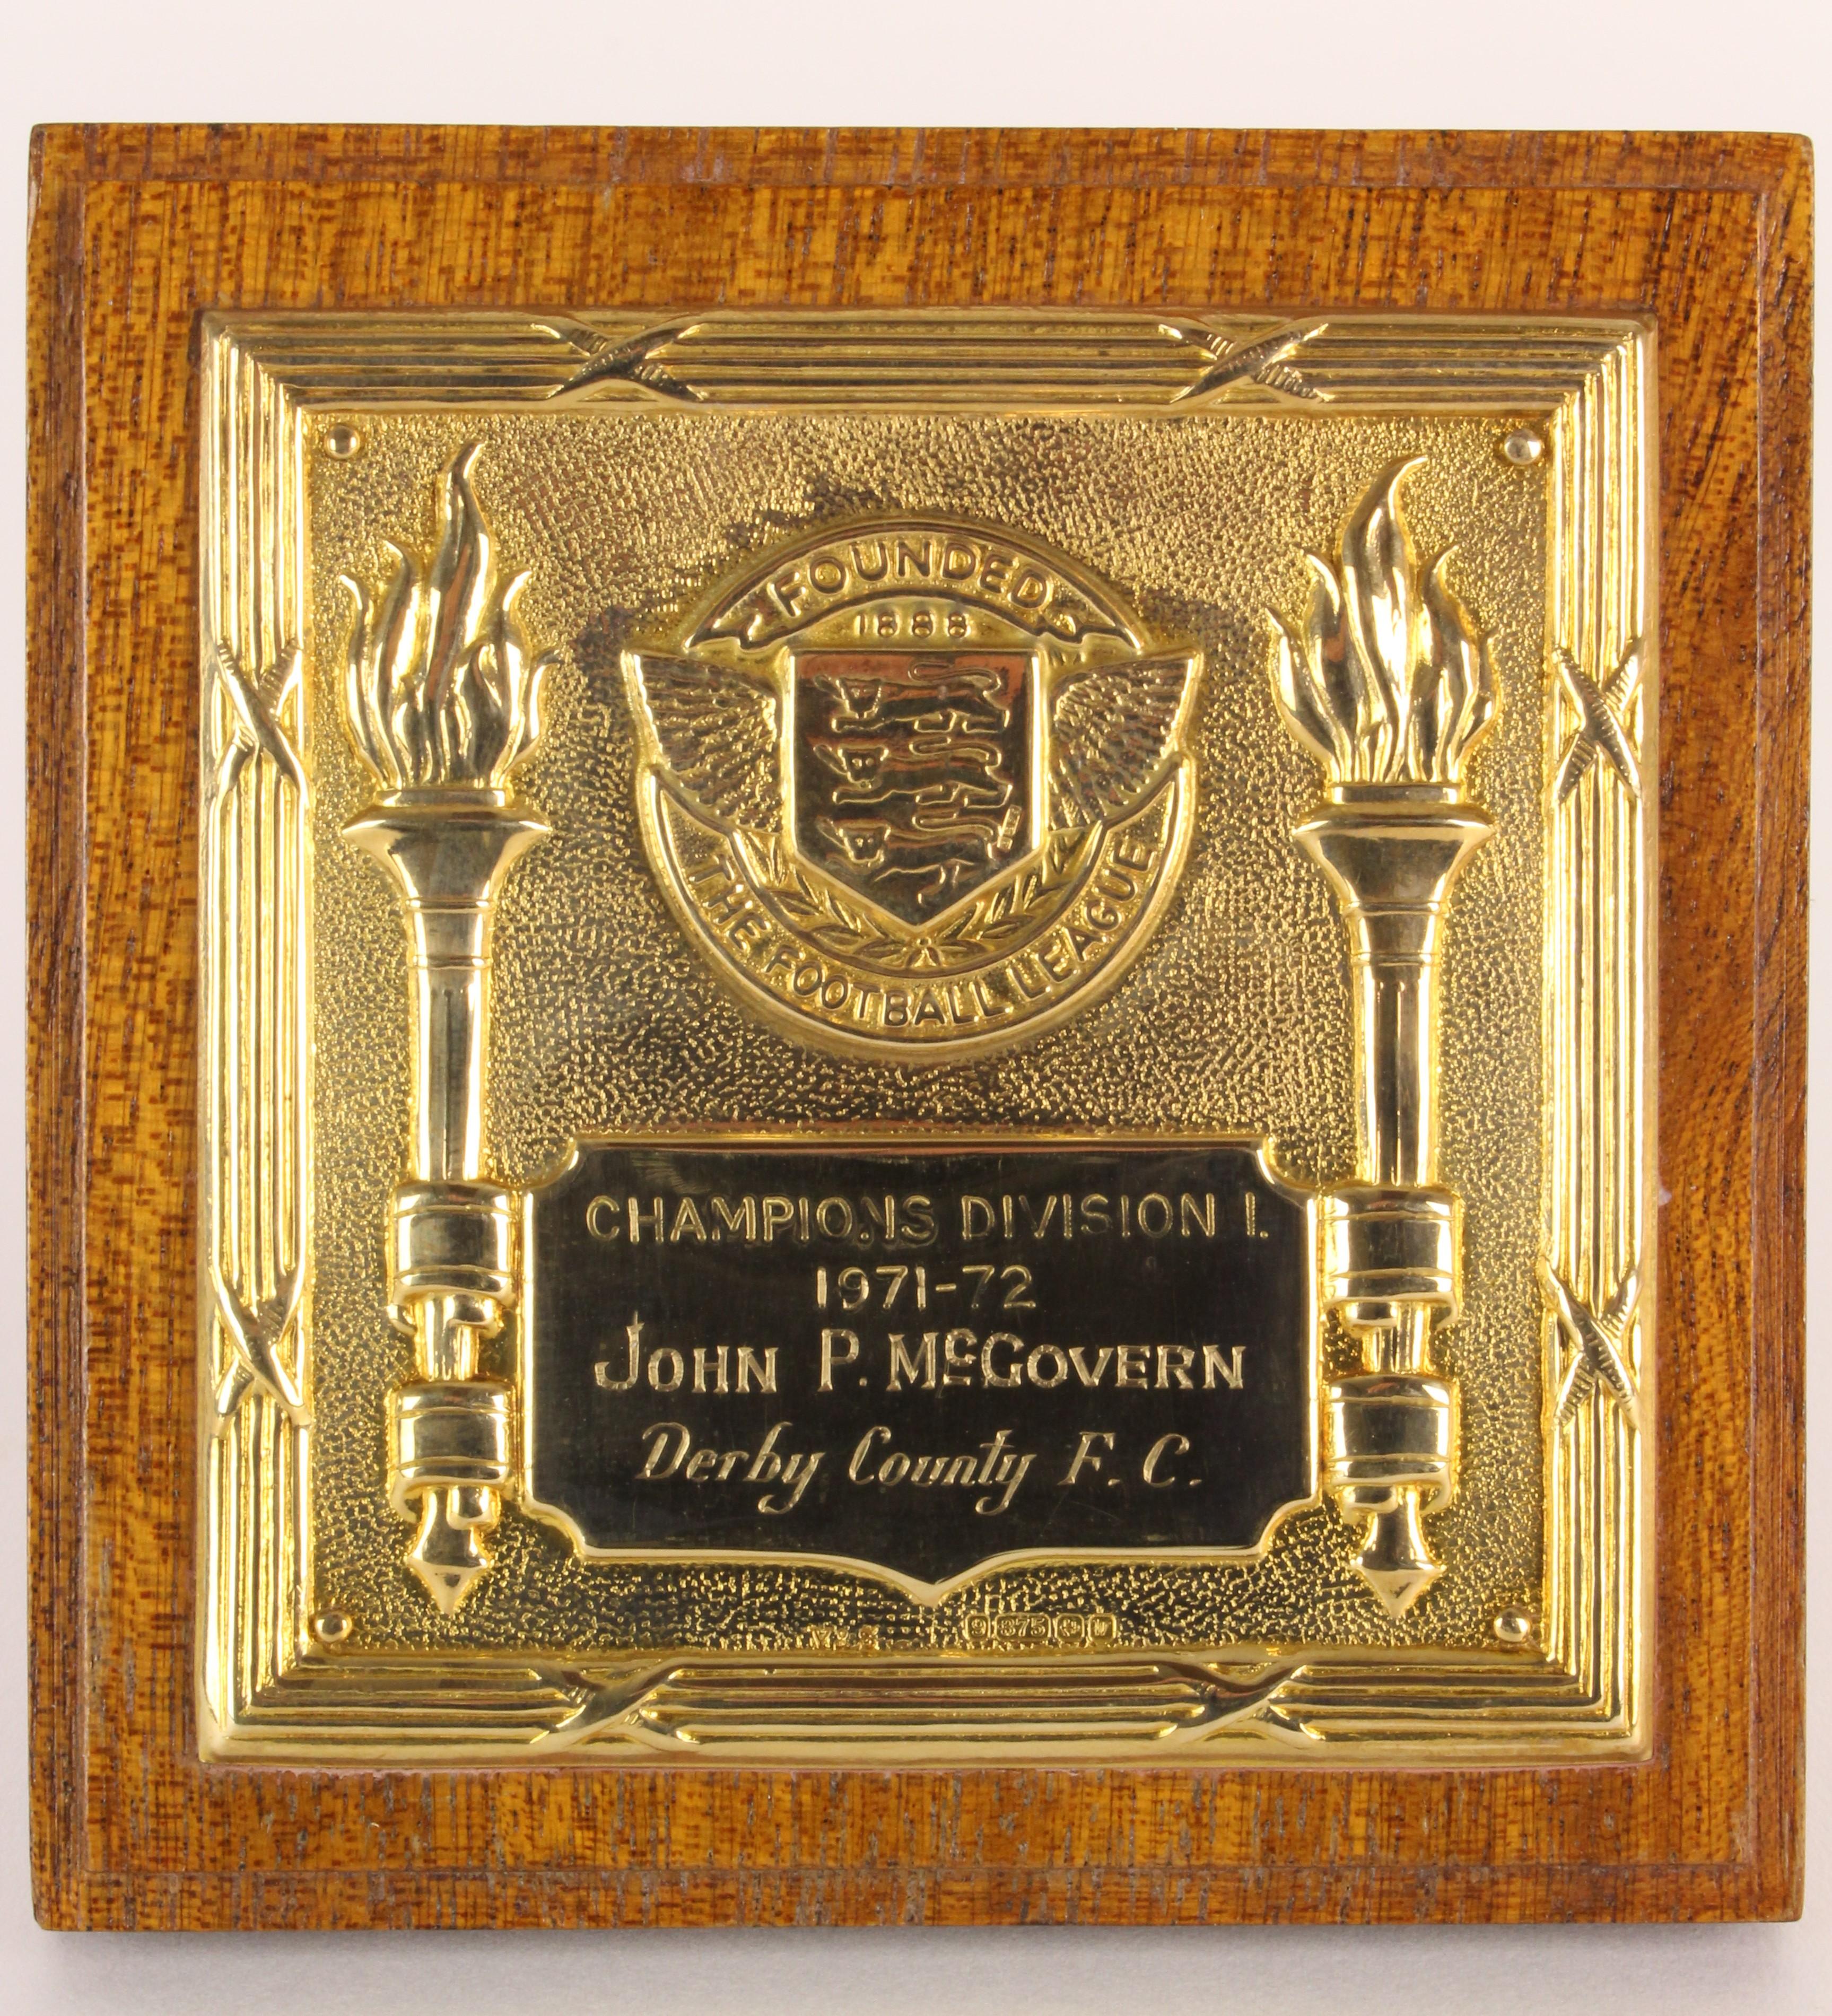 John McGovern's Derby County Football League Division 1 Winner's medal, season 1971/72, in original box